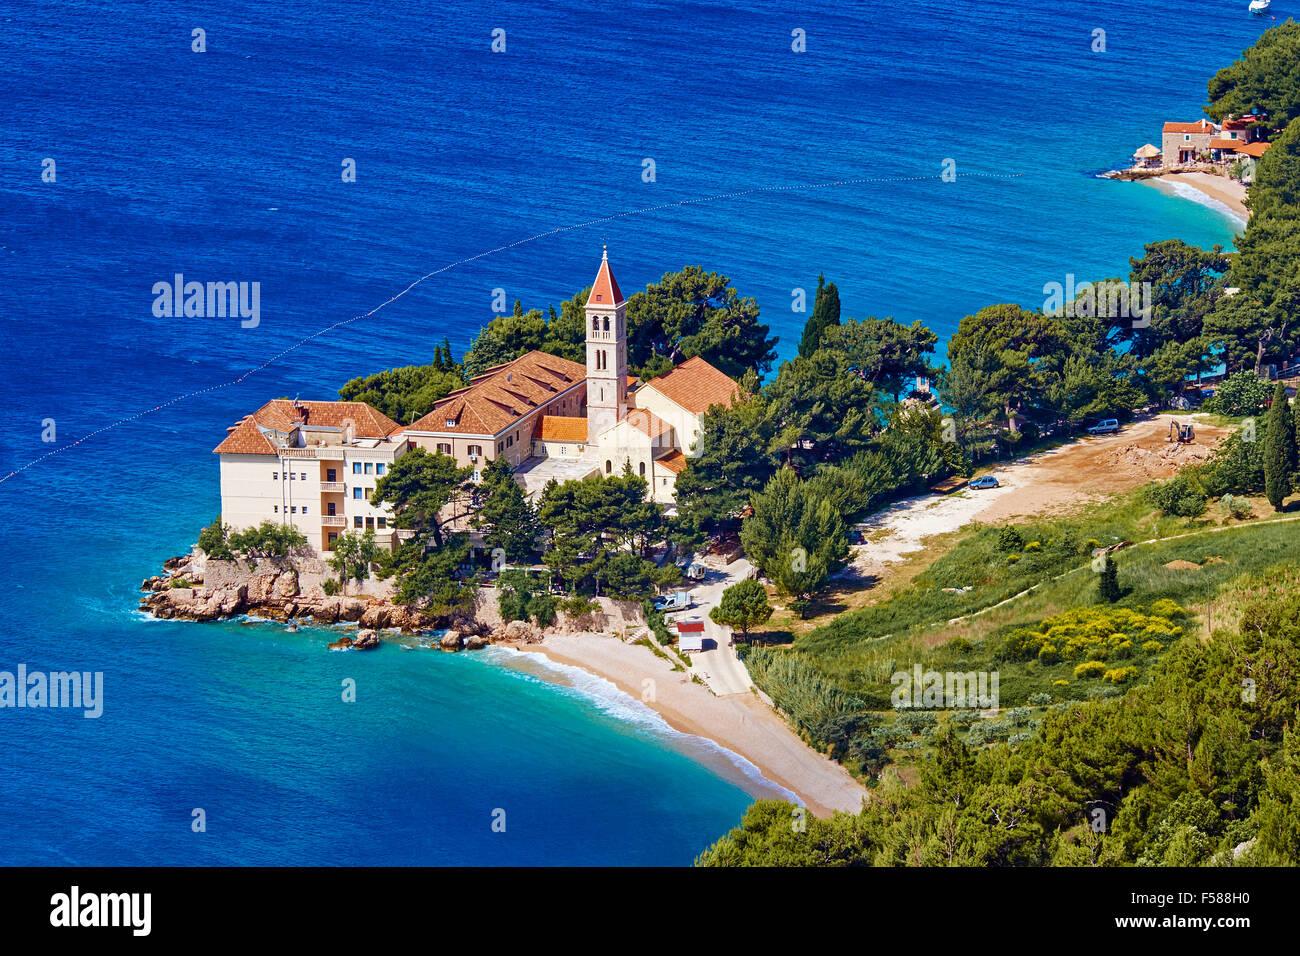 Croatia, Dalmatia, Brac island, Bol - Stock Image